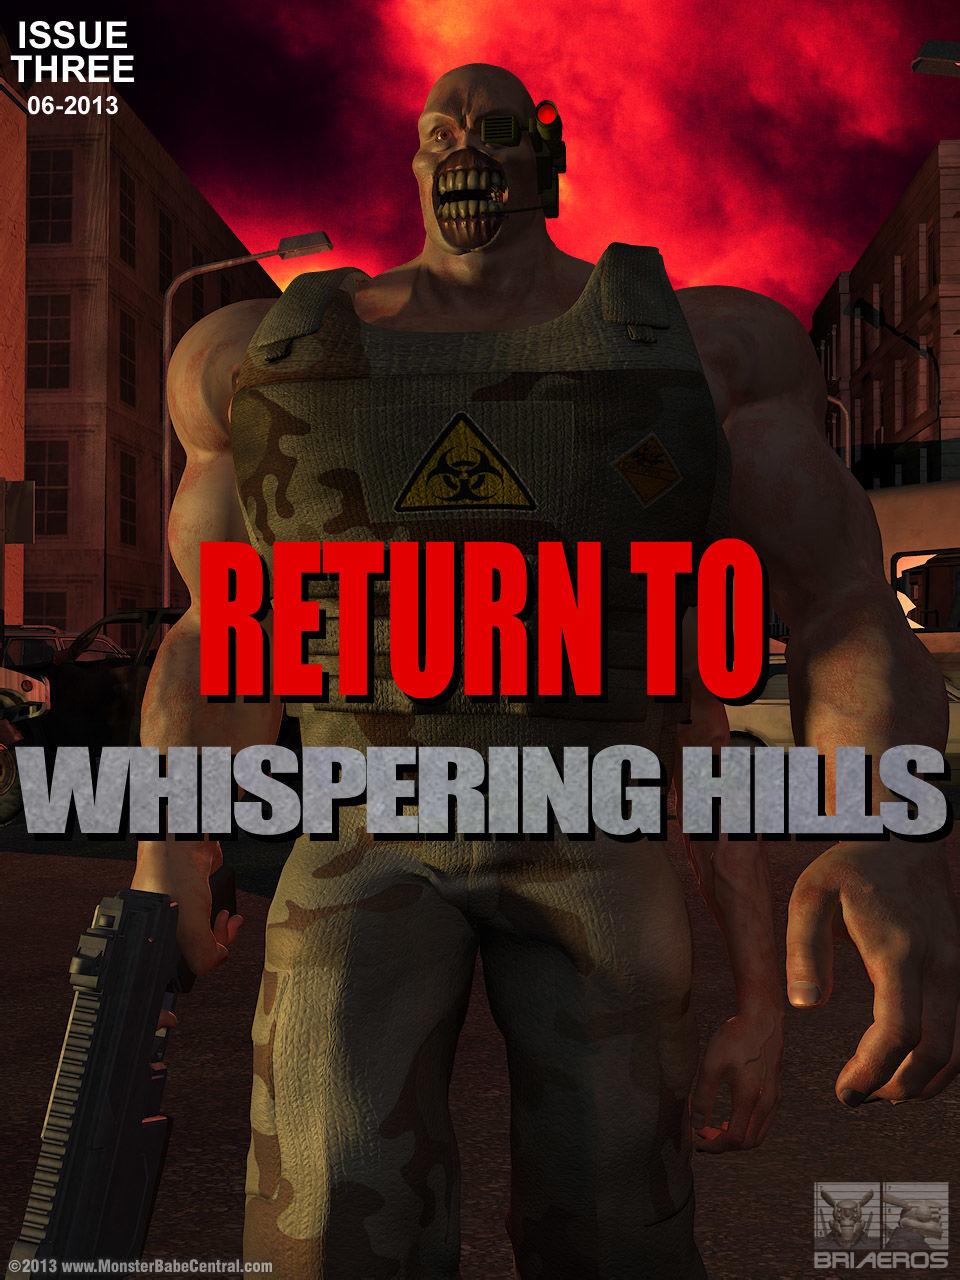 Return to Whispering Hills - part 3